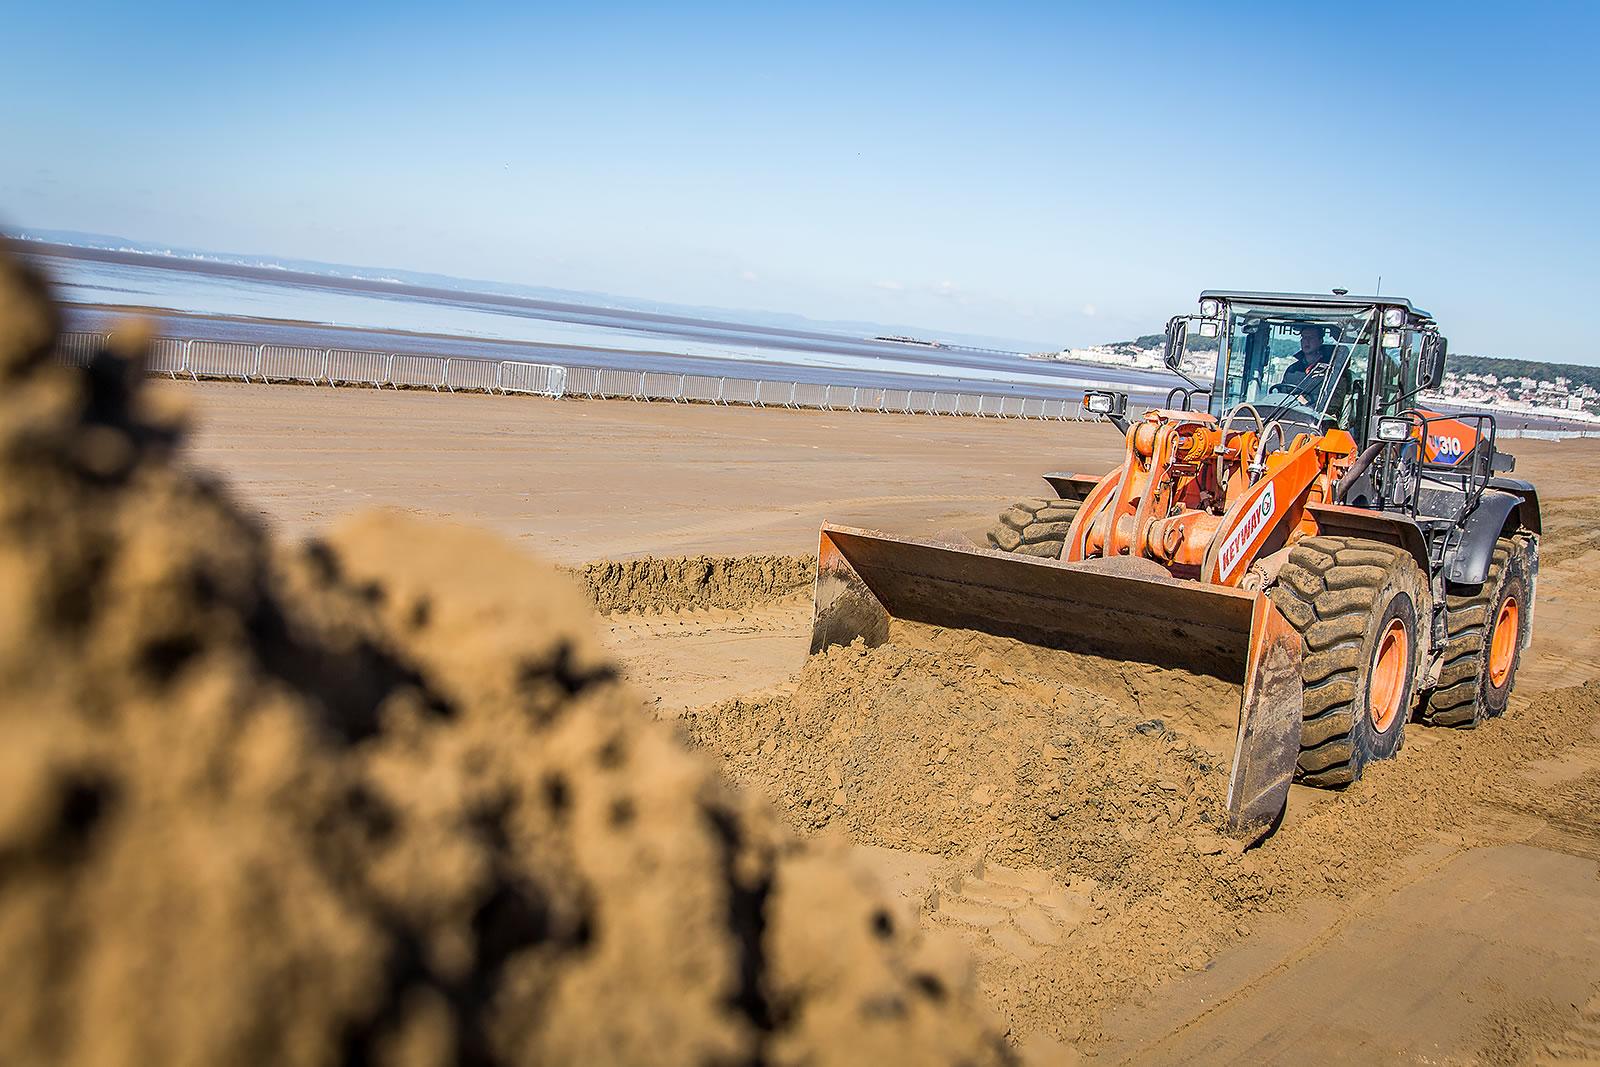 Hitachi ZW310-6 wheel loader moves sand on Weston beach